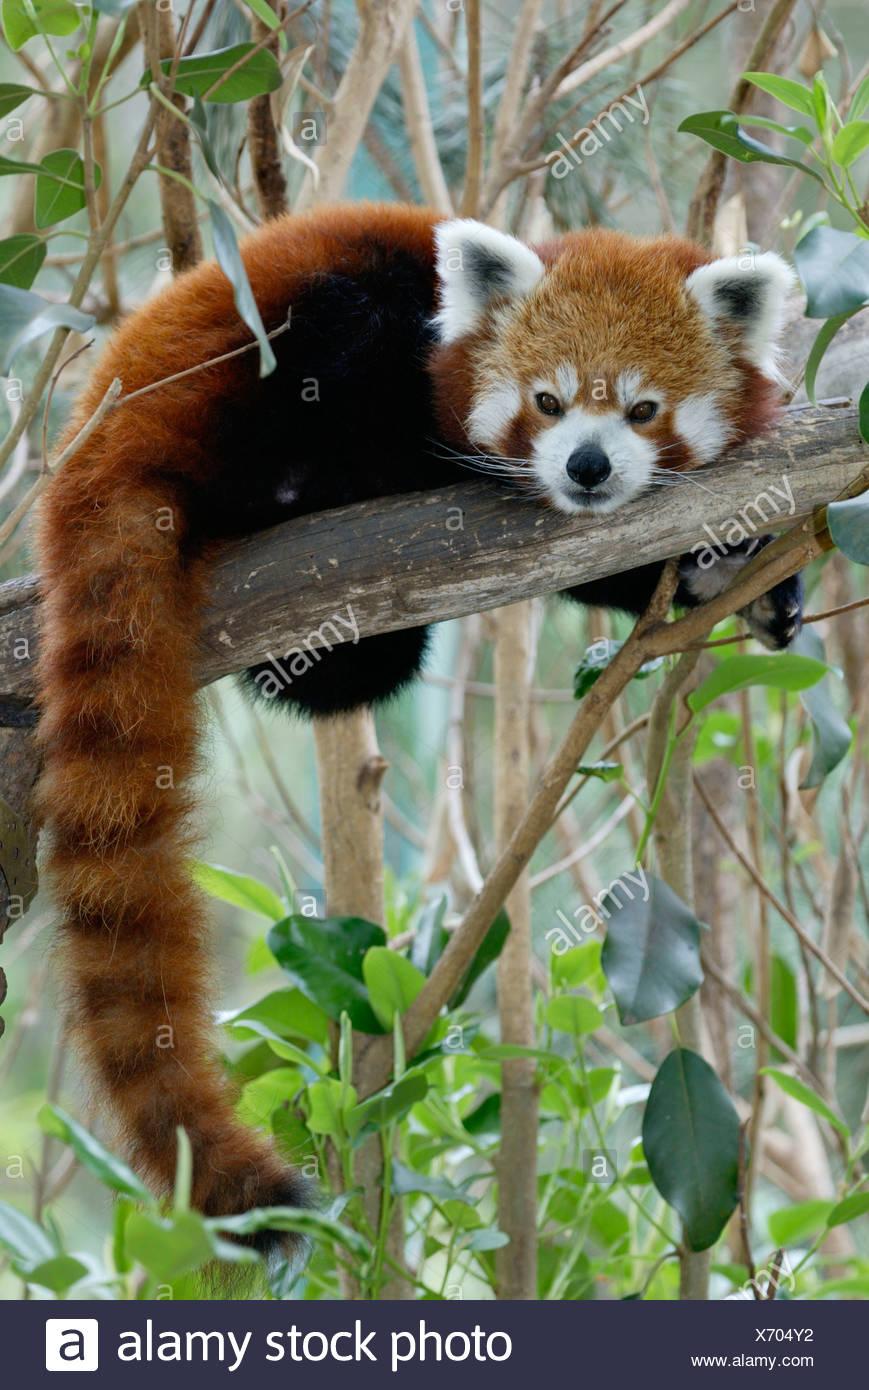 roter panda kleiner panda katzenbaer stockfoto bild 279672374 alamy. Black Bedroom Furniture Sets. Home Design Ideas